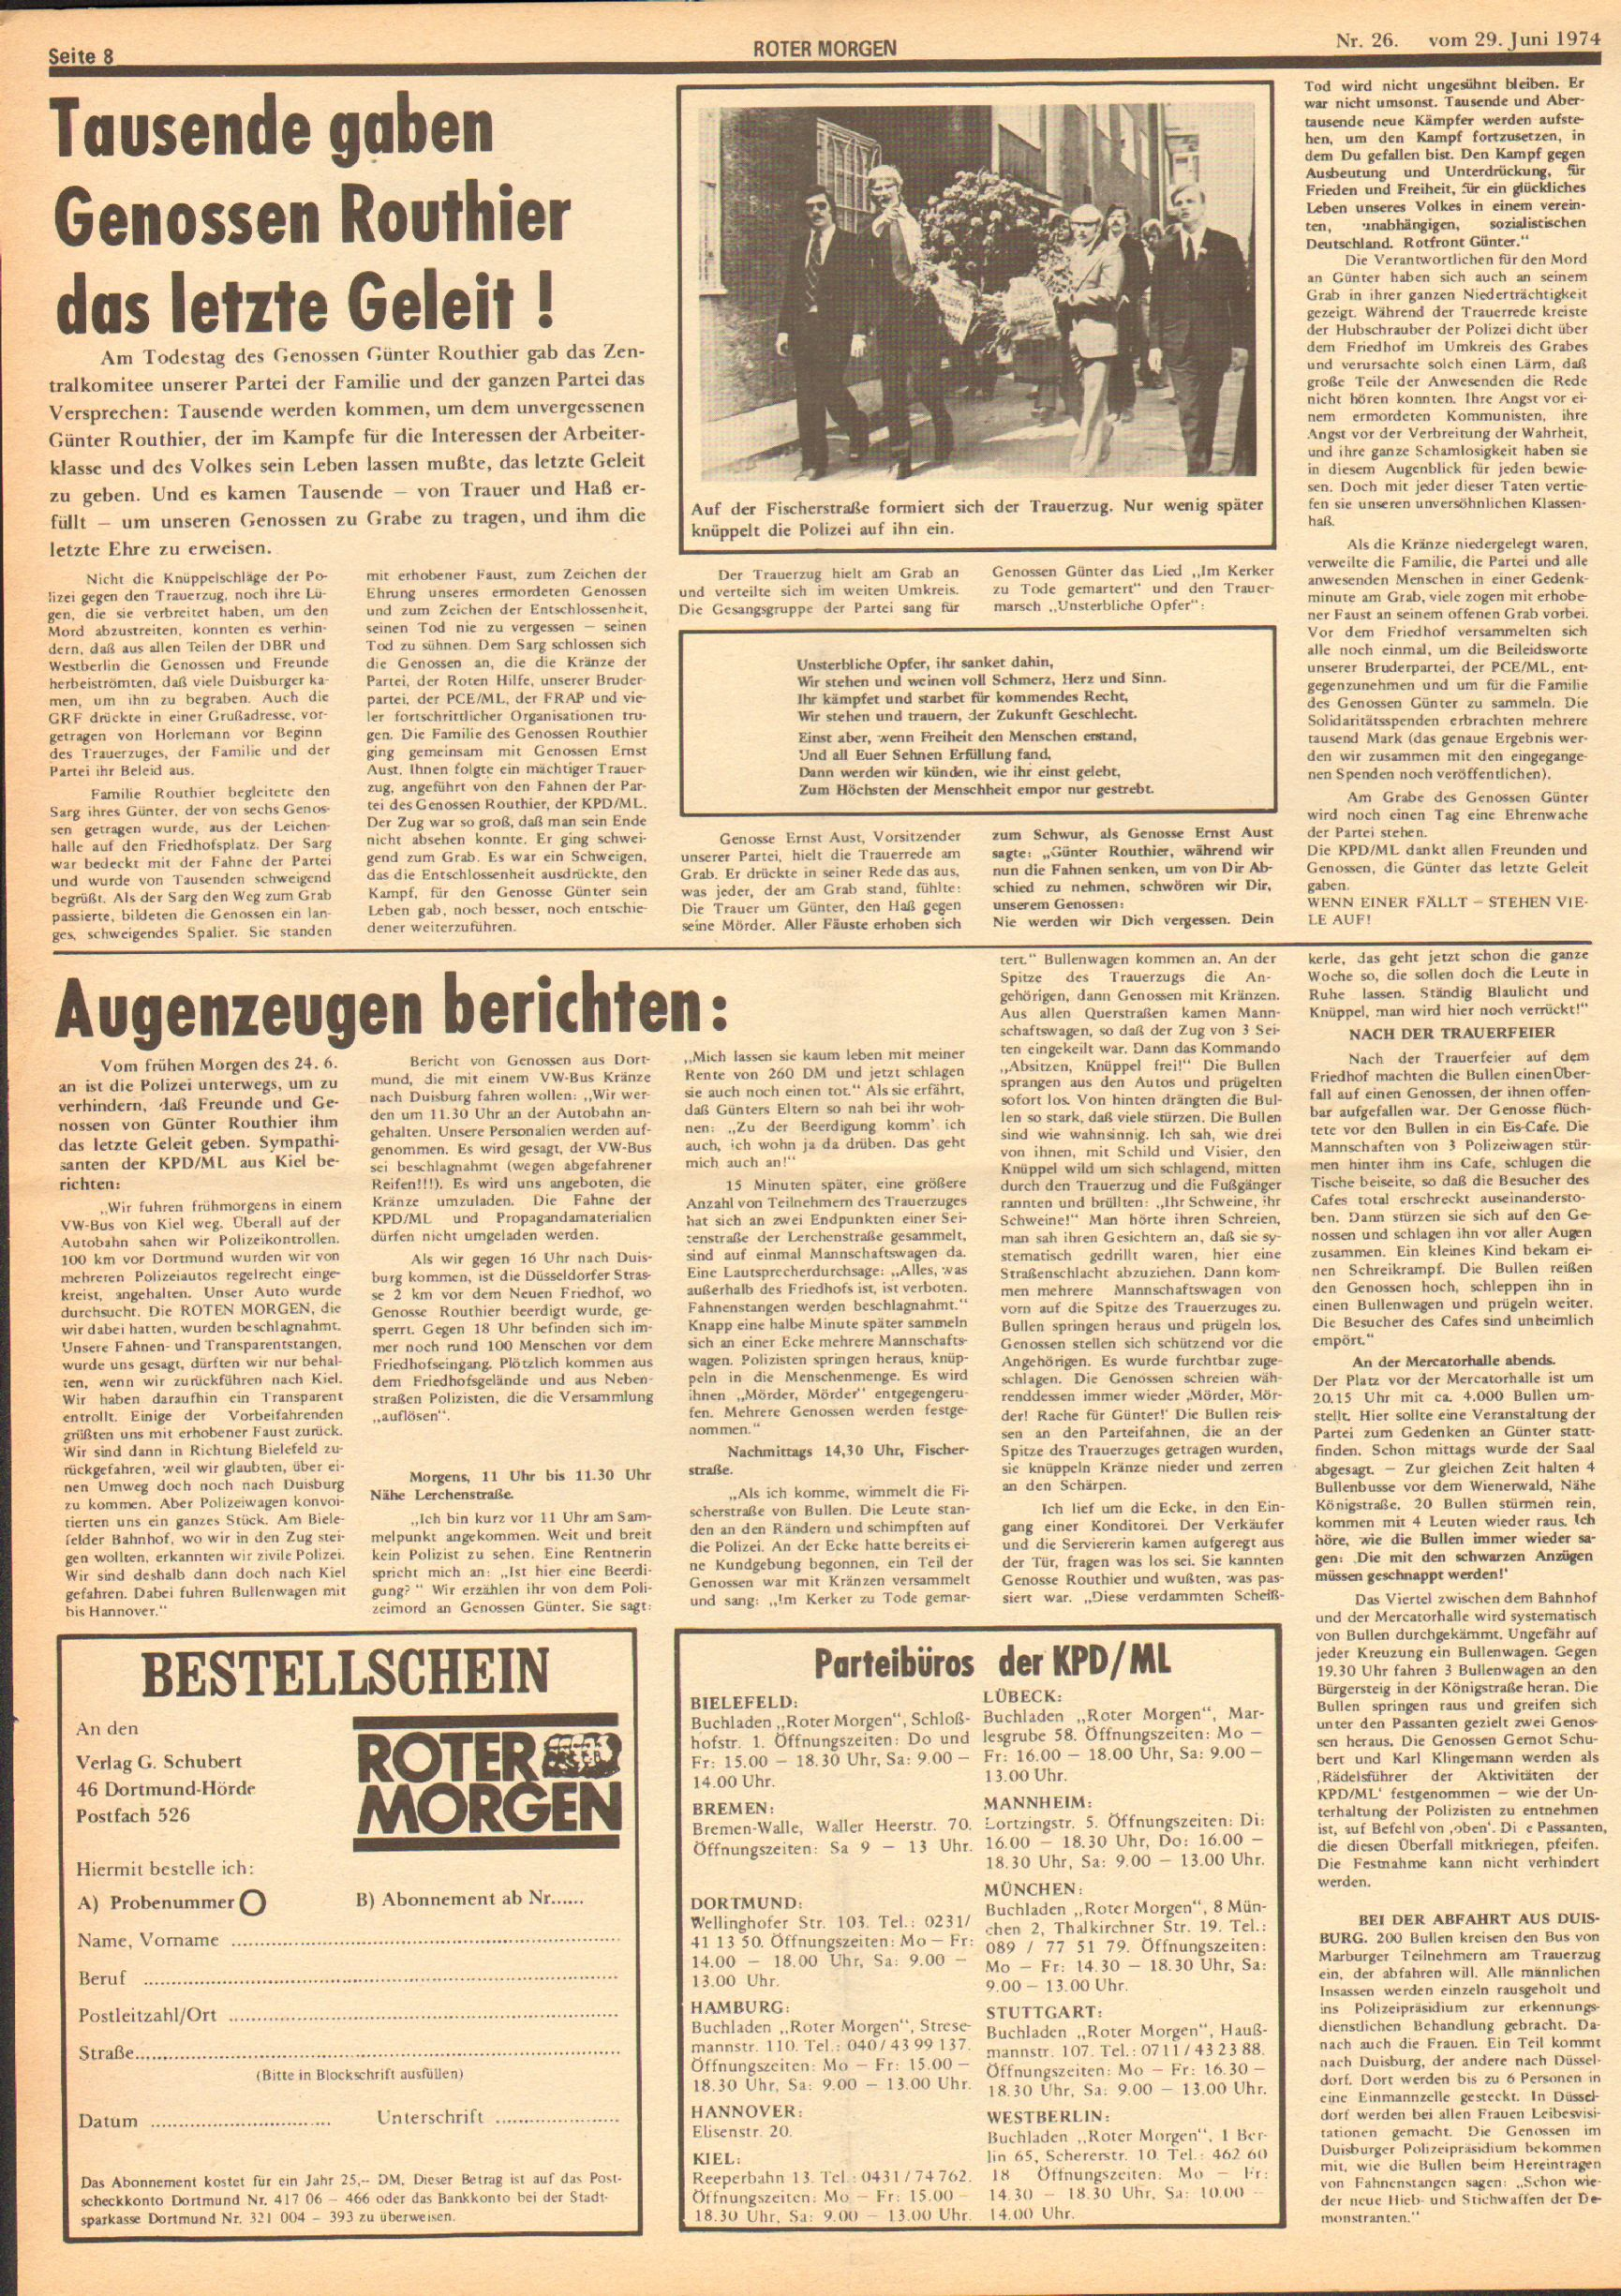 Roter Morgen, 8. Jg., 29. Juni 1974, Nr. 26, Seite 8